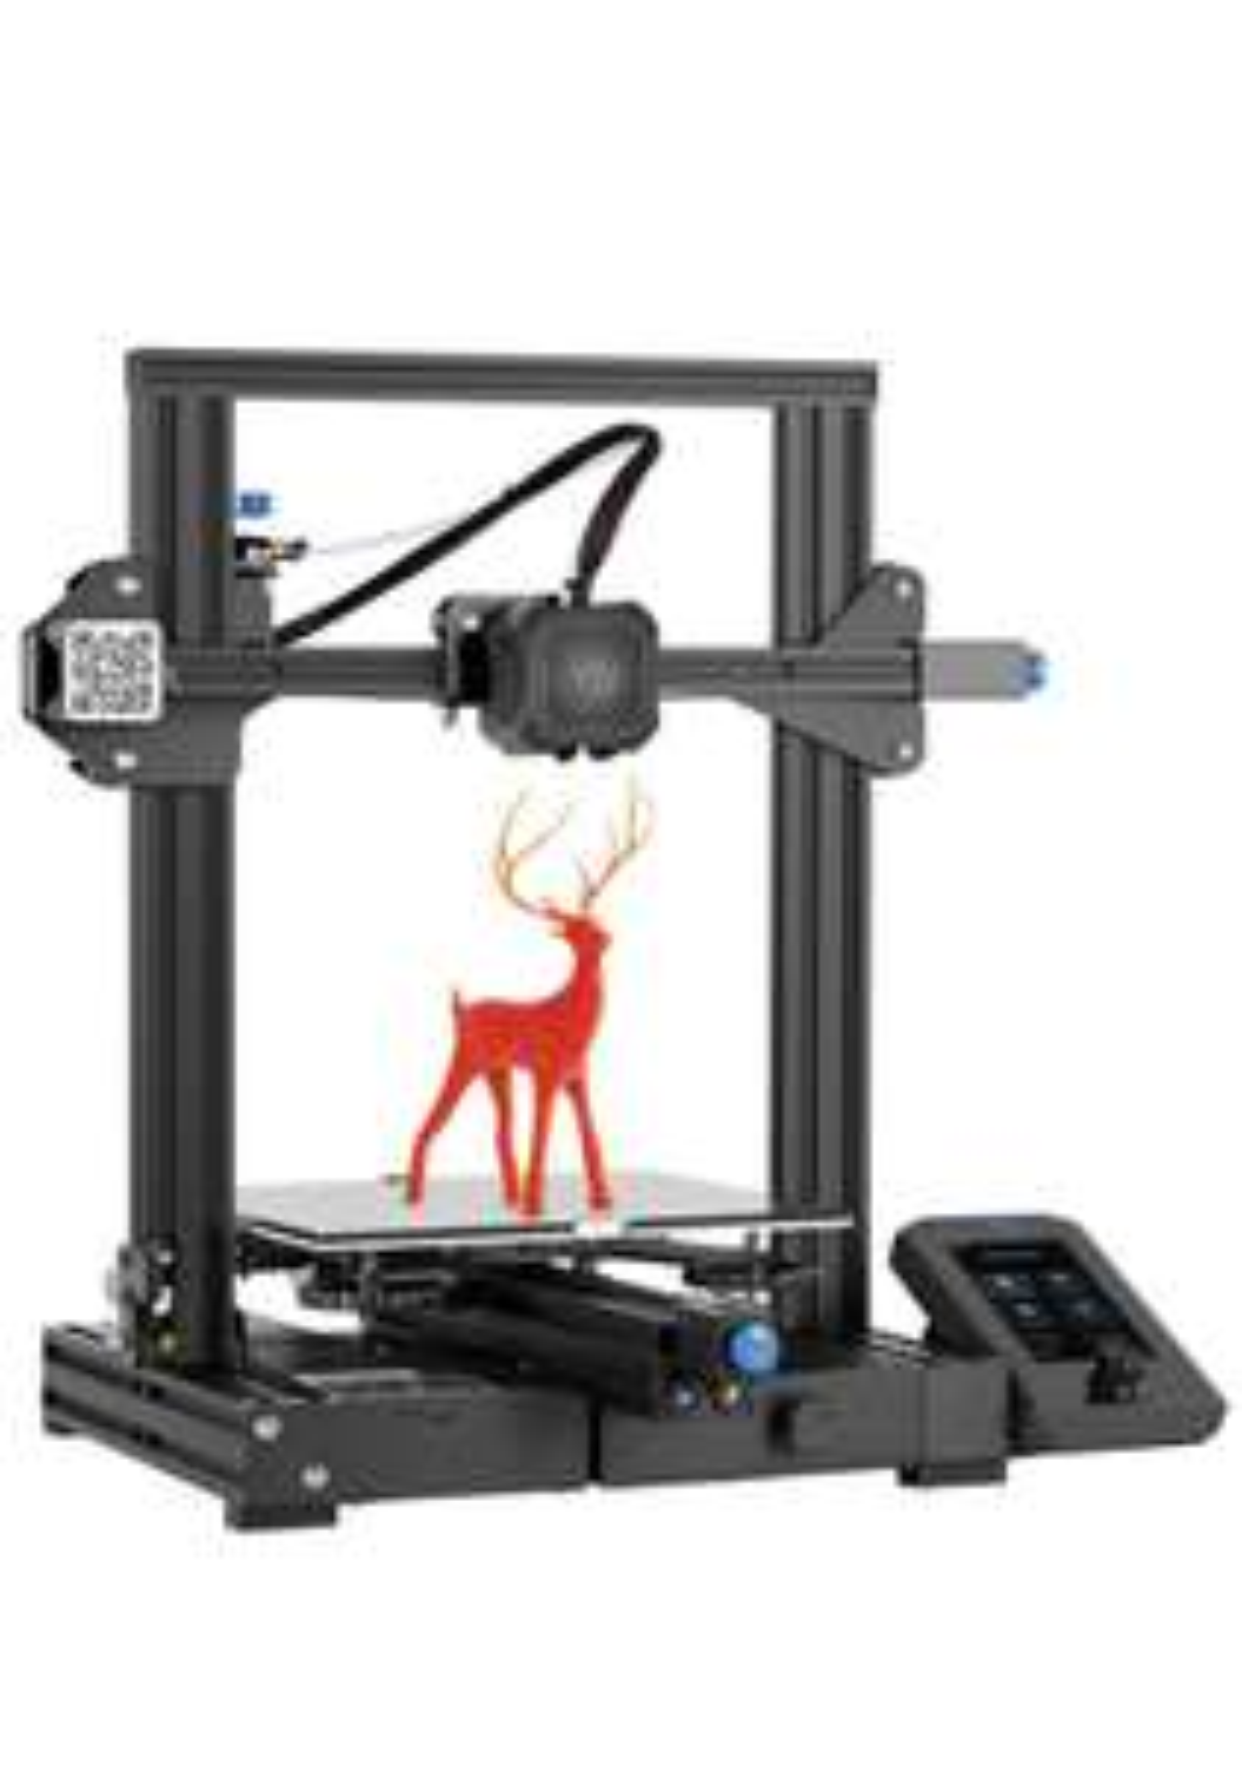 [Prime] Imprimante 3D Creality Ender 3 V2 (Vendeur Tiers)